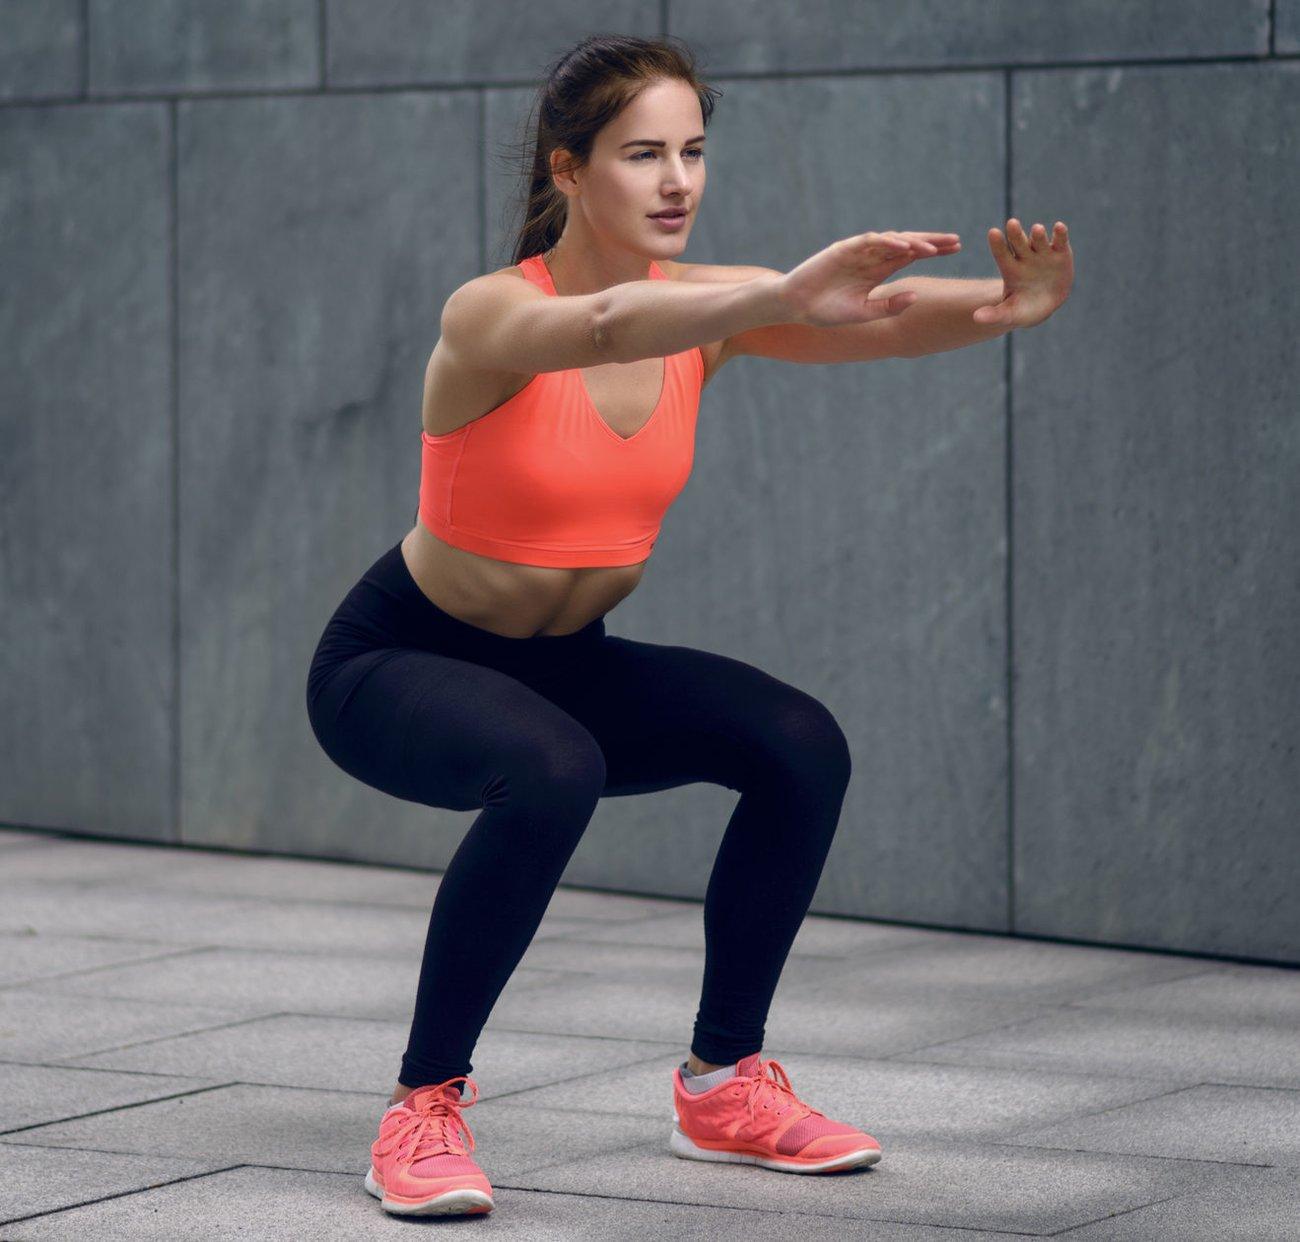 Frau macht Squats